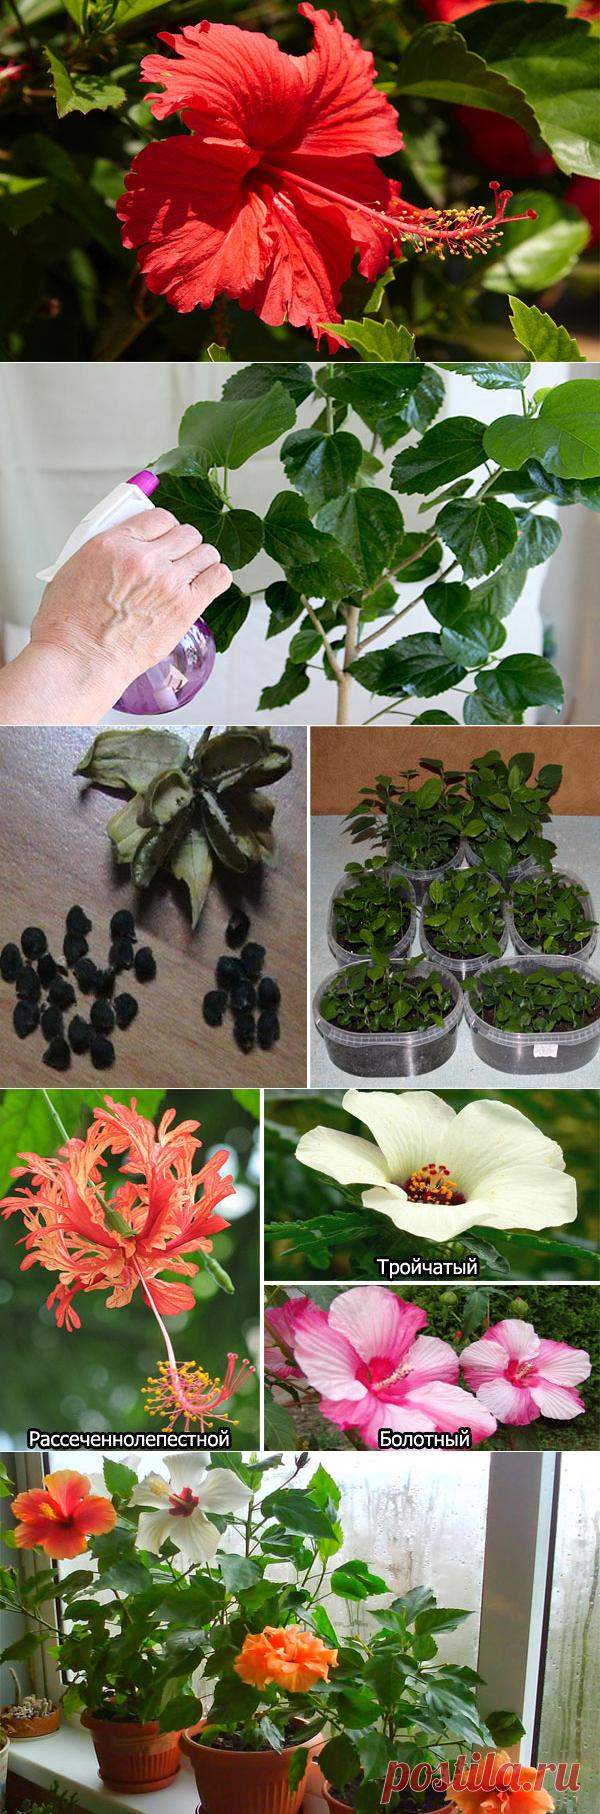 Цветок Гибискус: уход в домашних условиях, пересадка, размножение